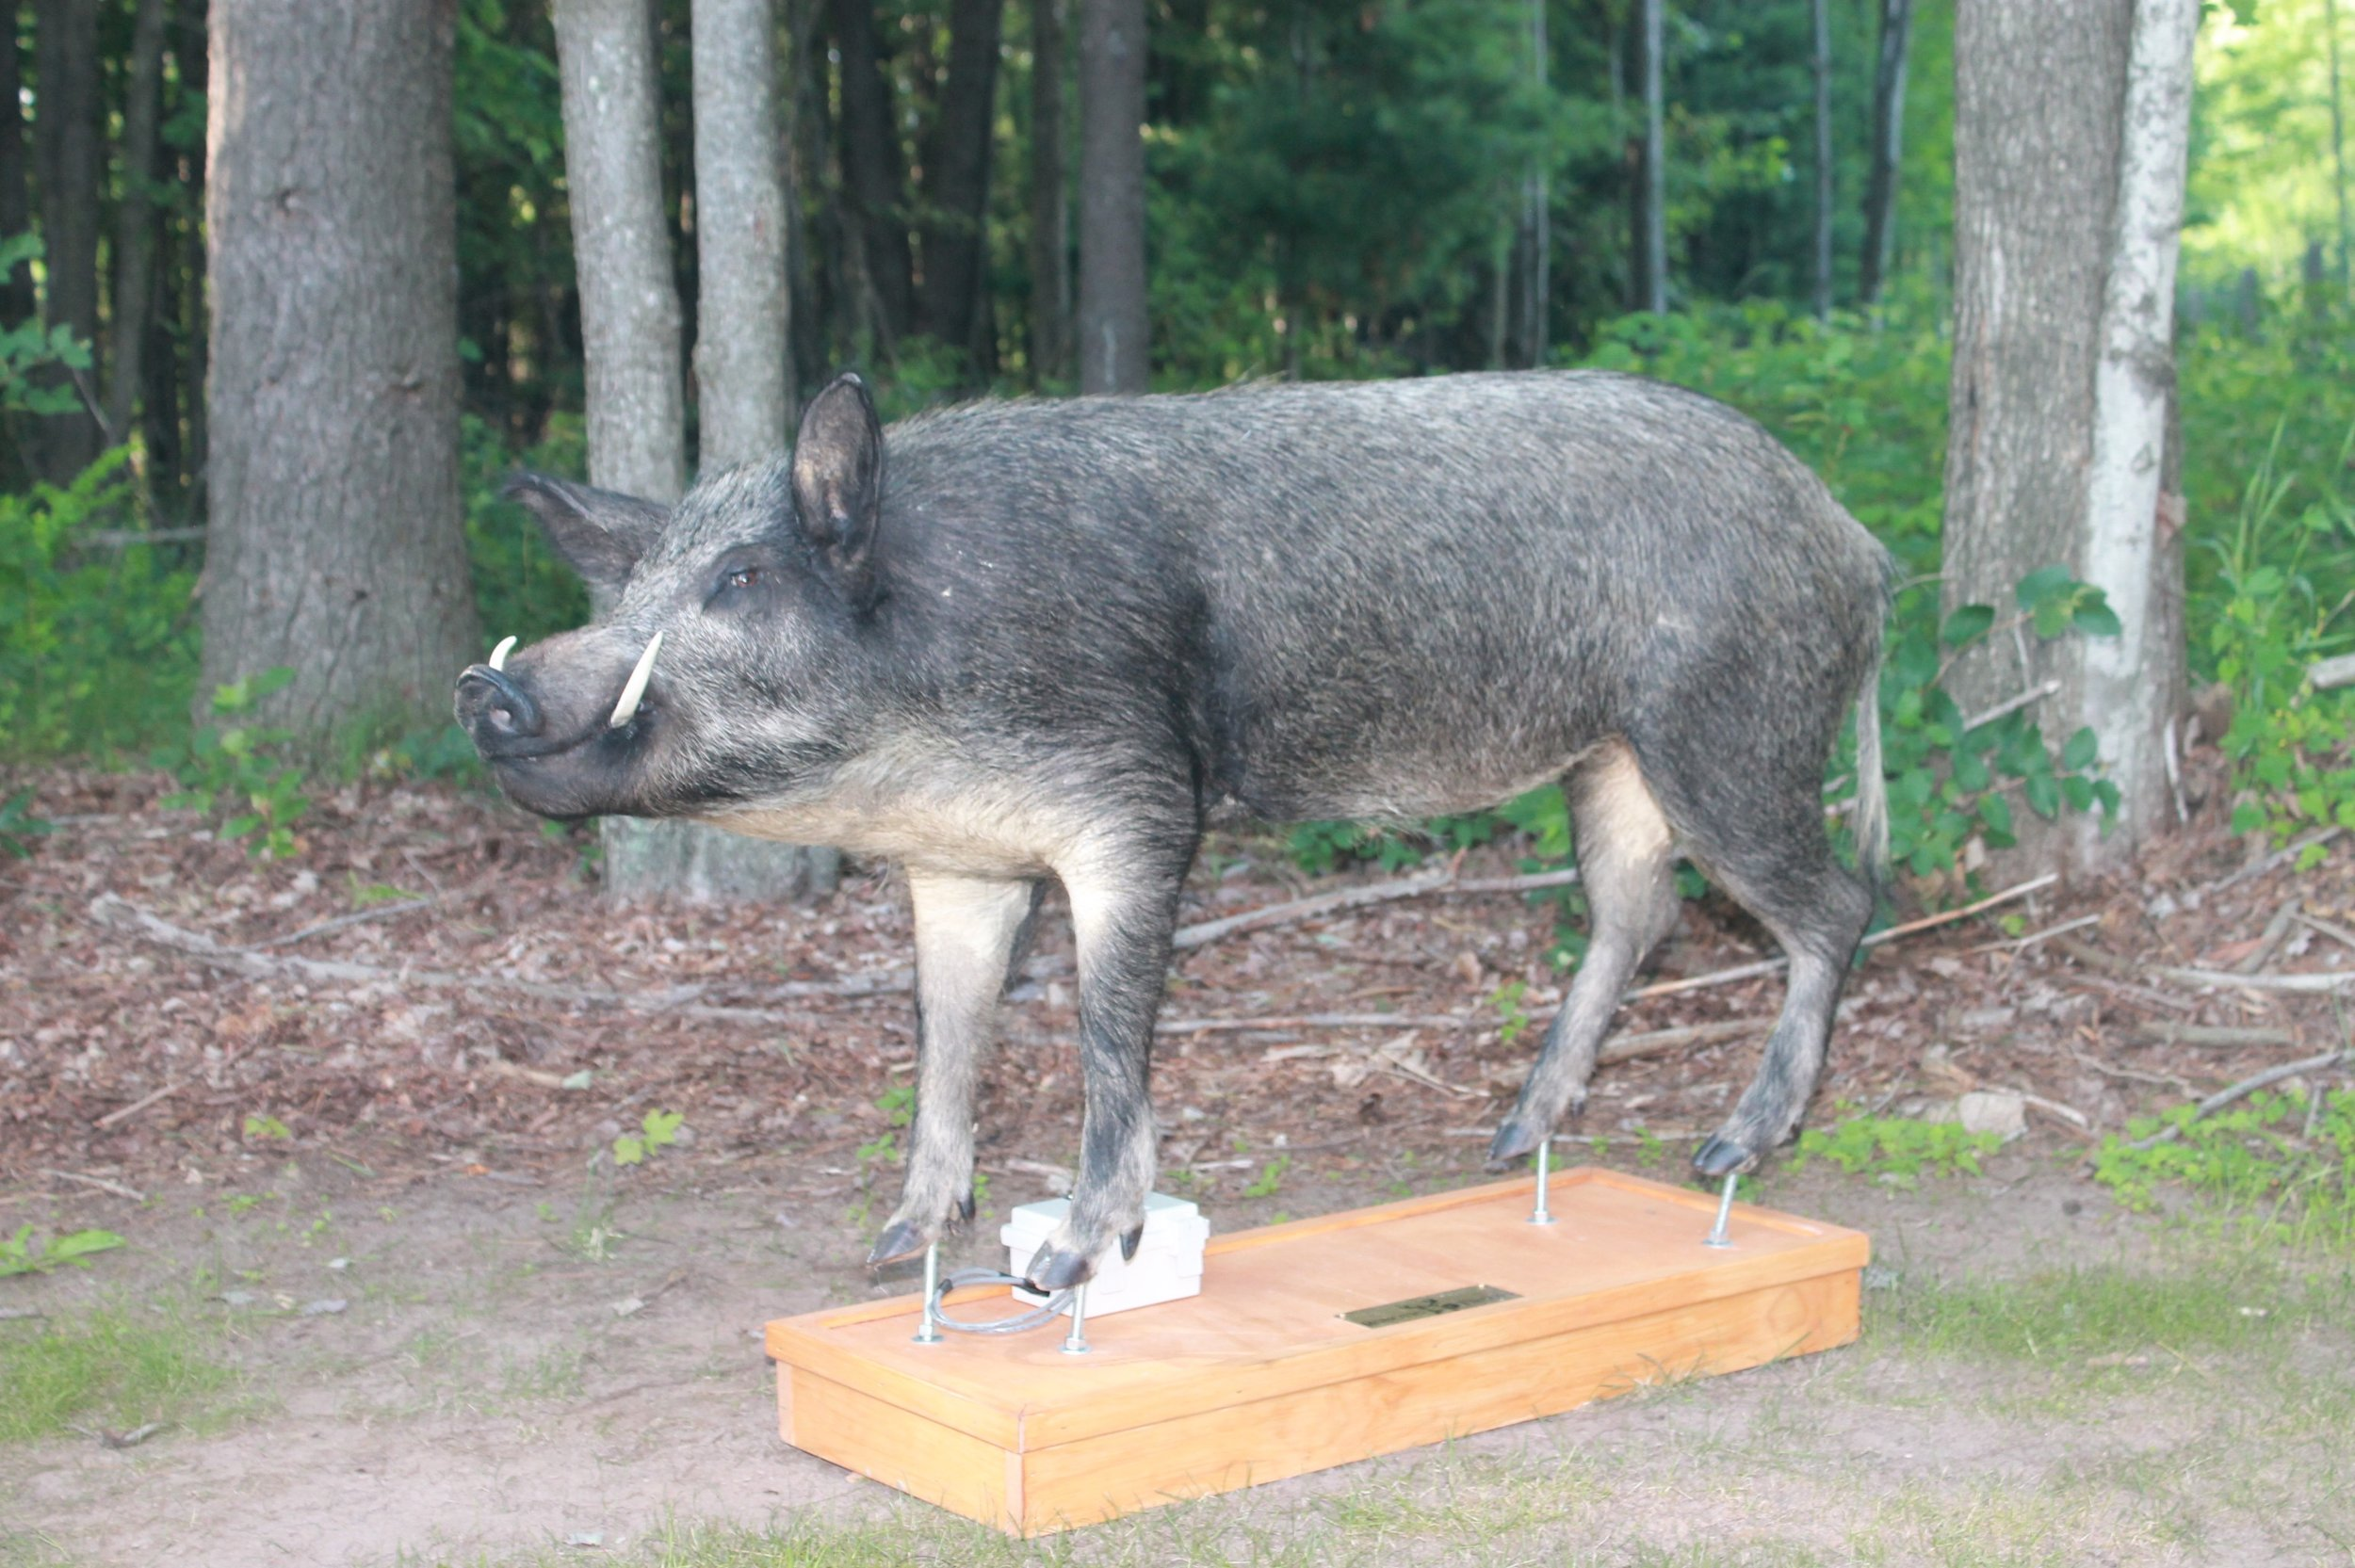 Robotic Hog Decoy